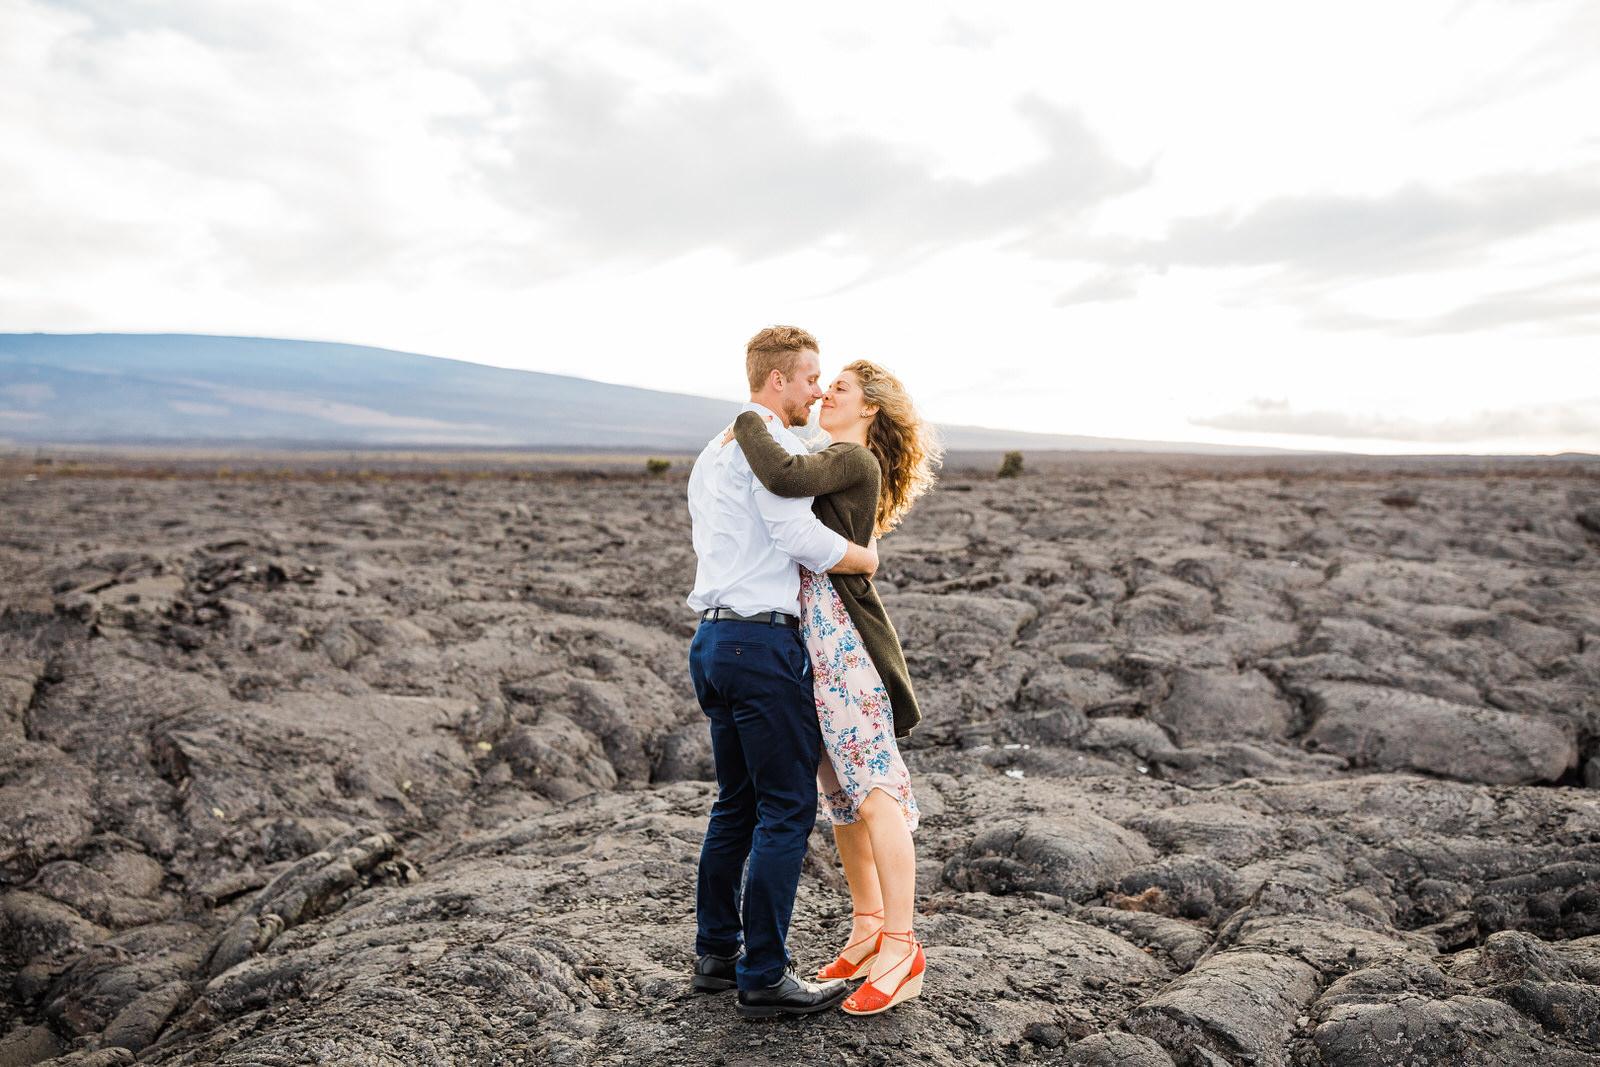 engagements-hilo-happy-couple-big-island-hawaii-7.jpg